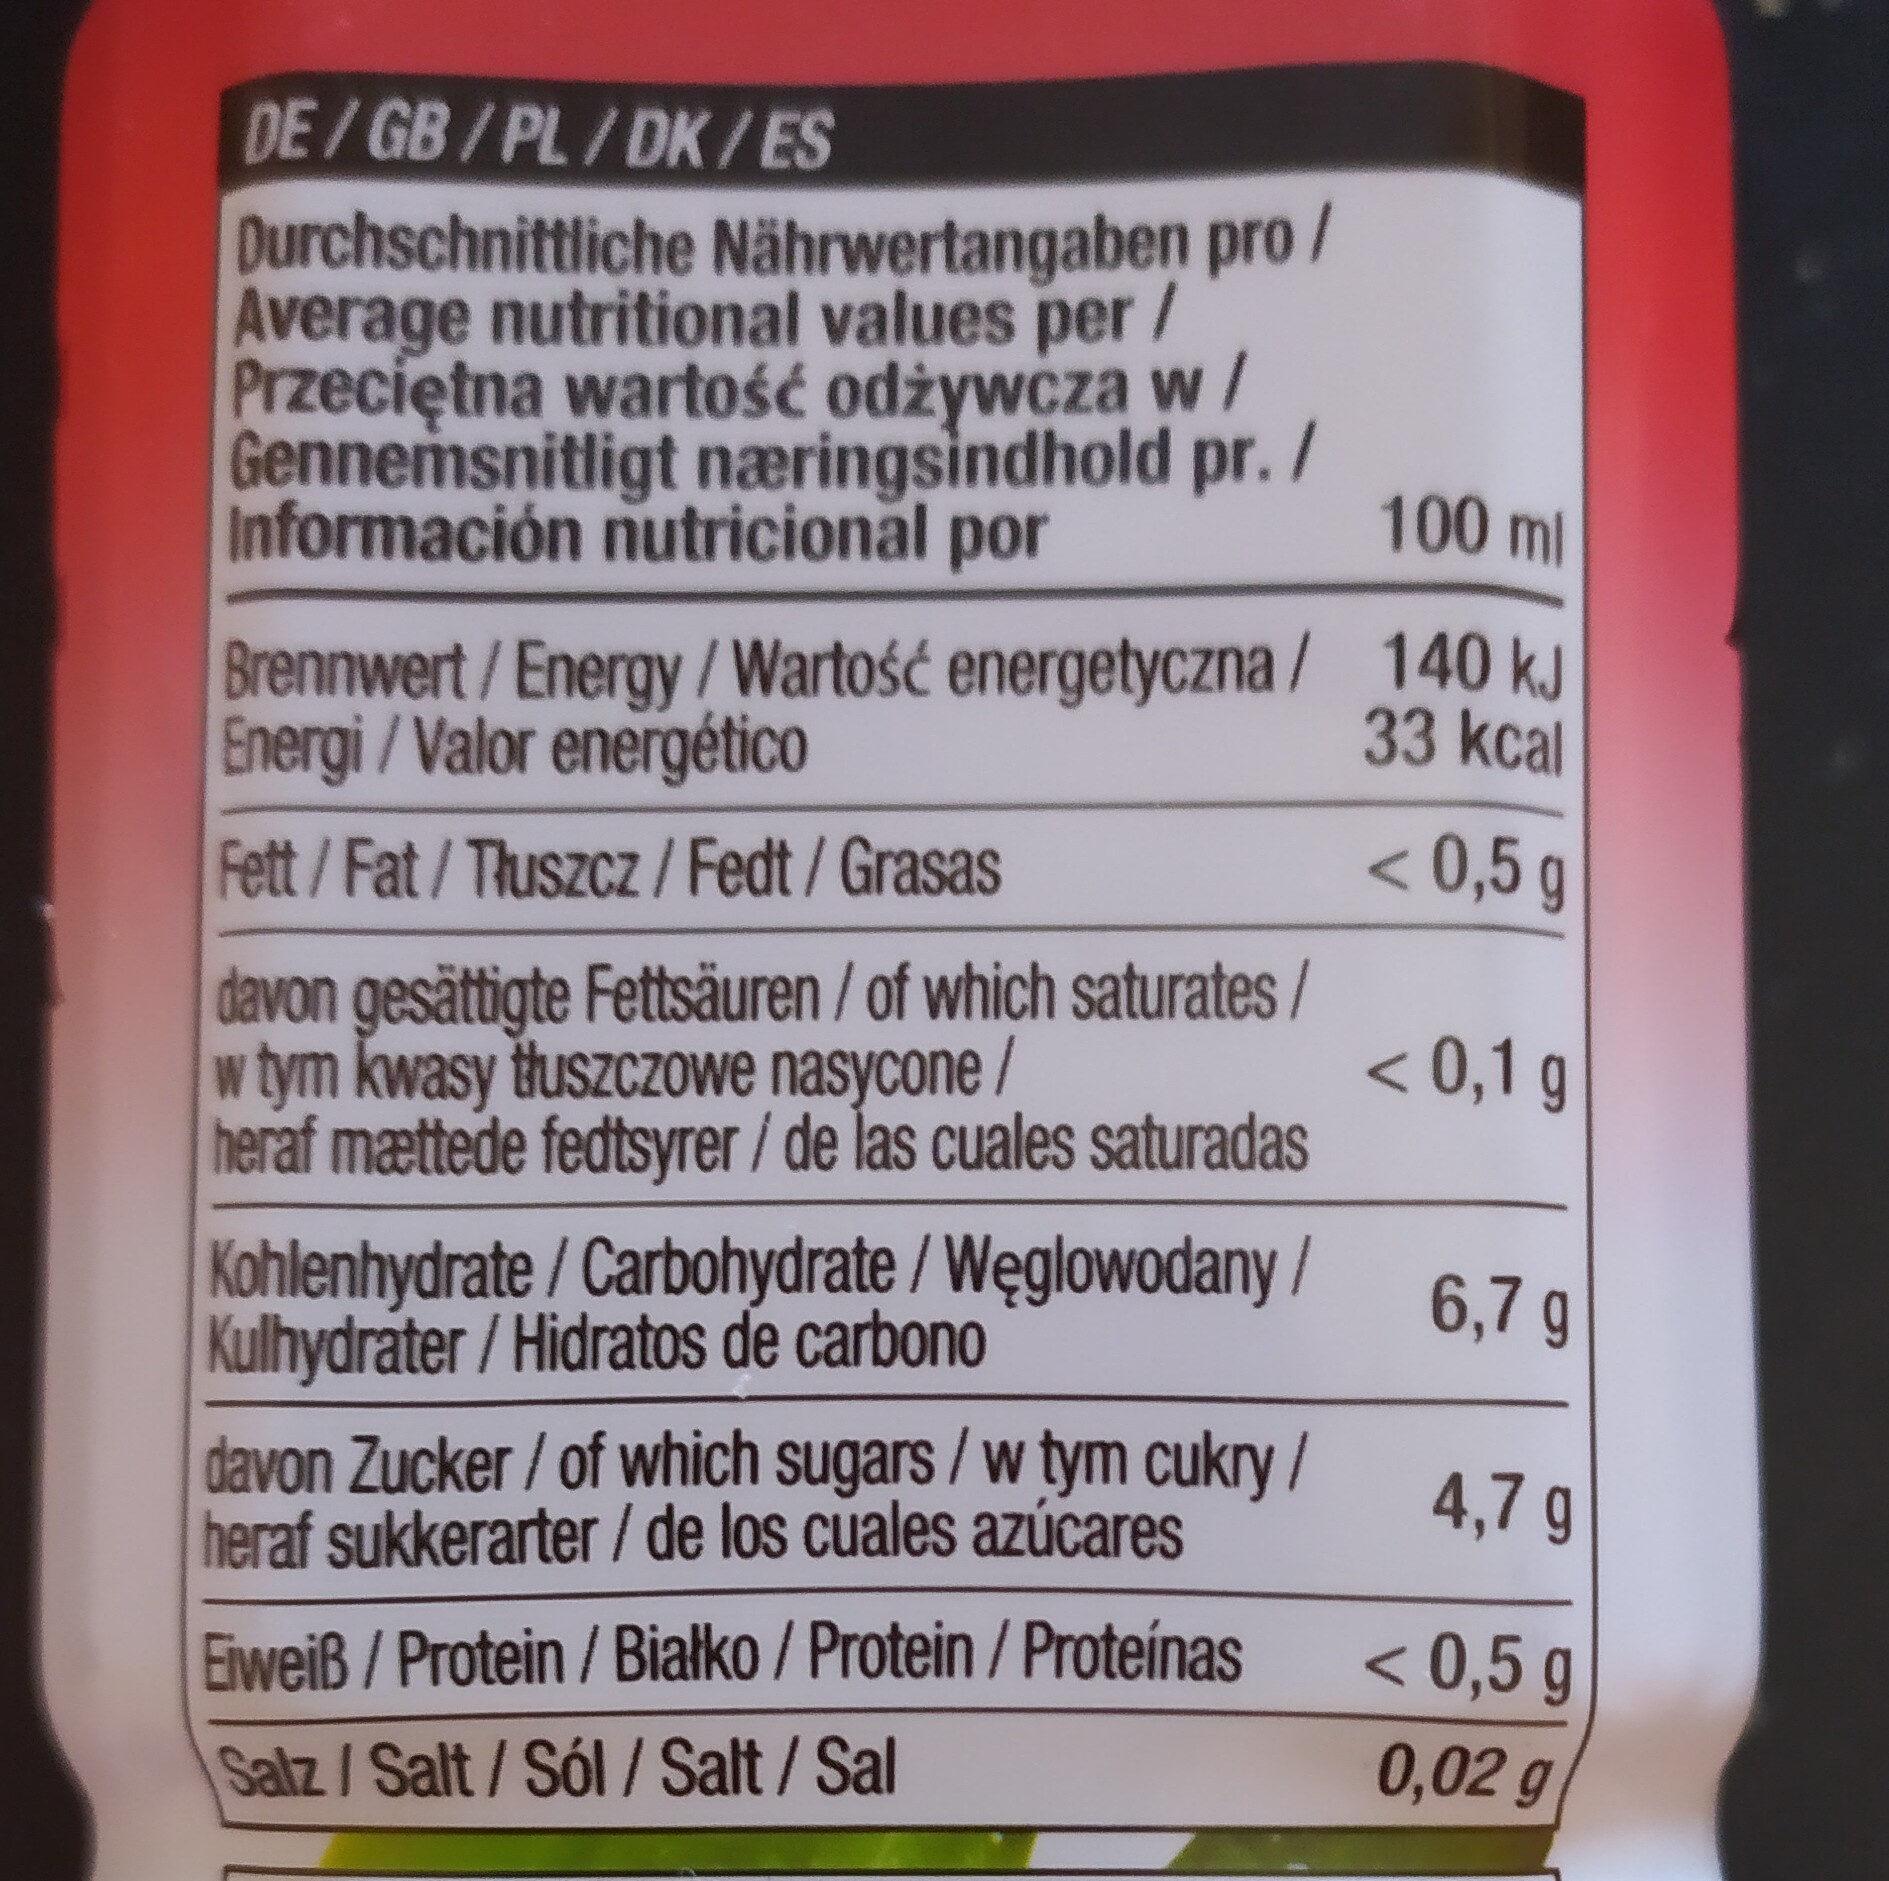 Nestar d'aloe vera gout framboise et thé noir - Información nutricional - es